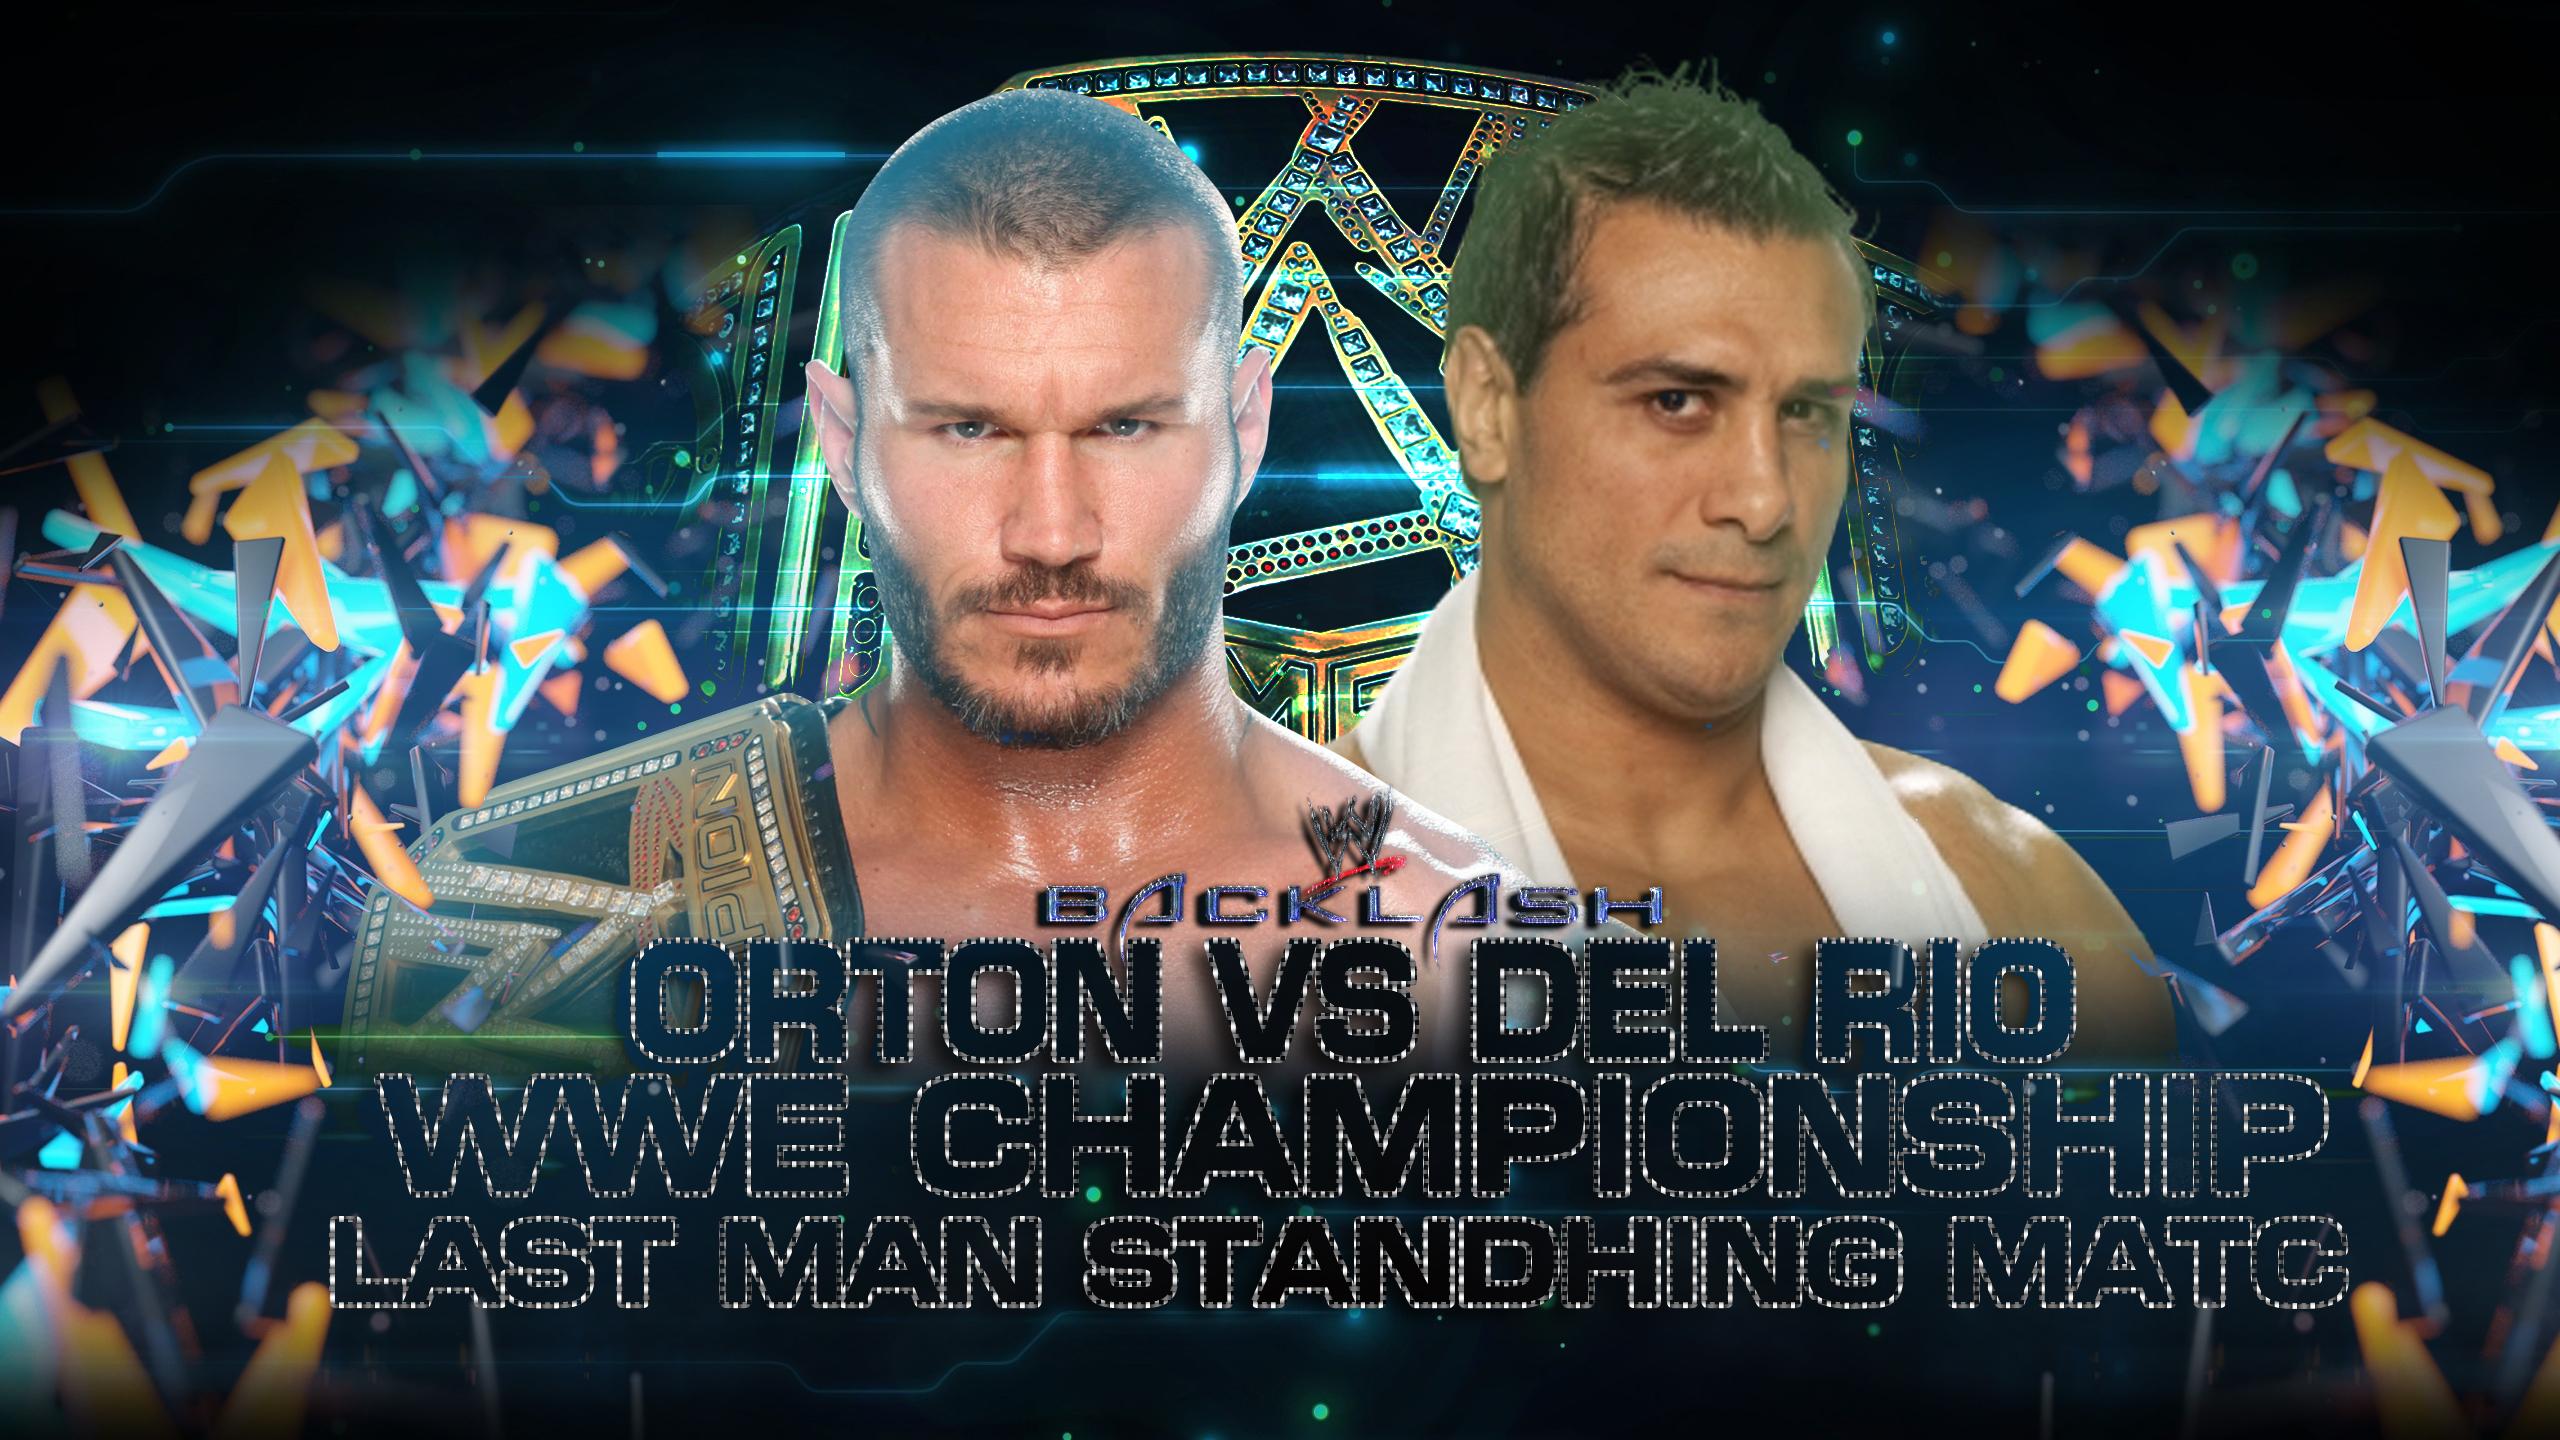 WWE Backlash Custom Match Card by Mohamed-Samir on DeviantArt